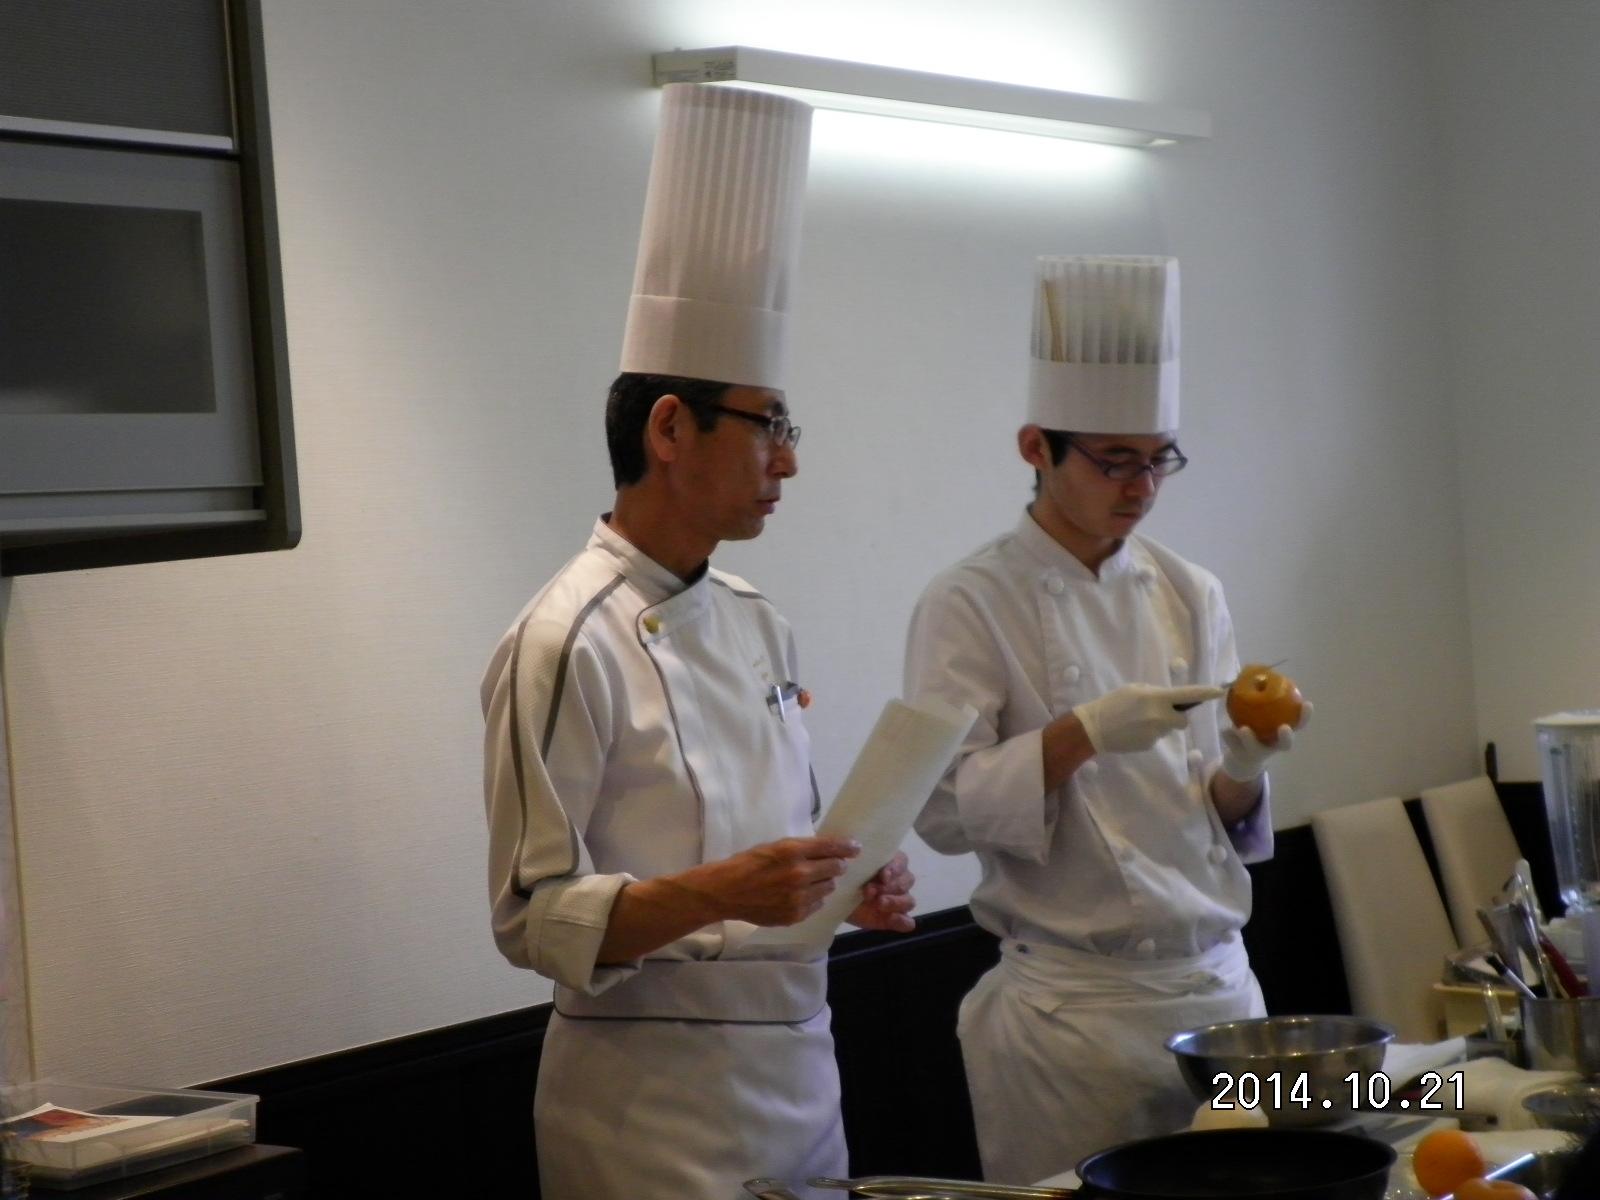 第44回お料理教室_e0190287_15431674.jpg